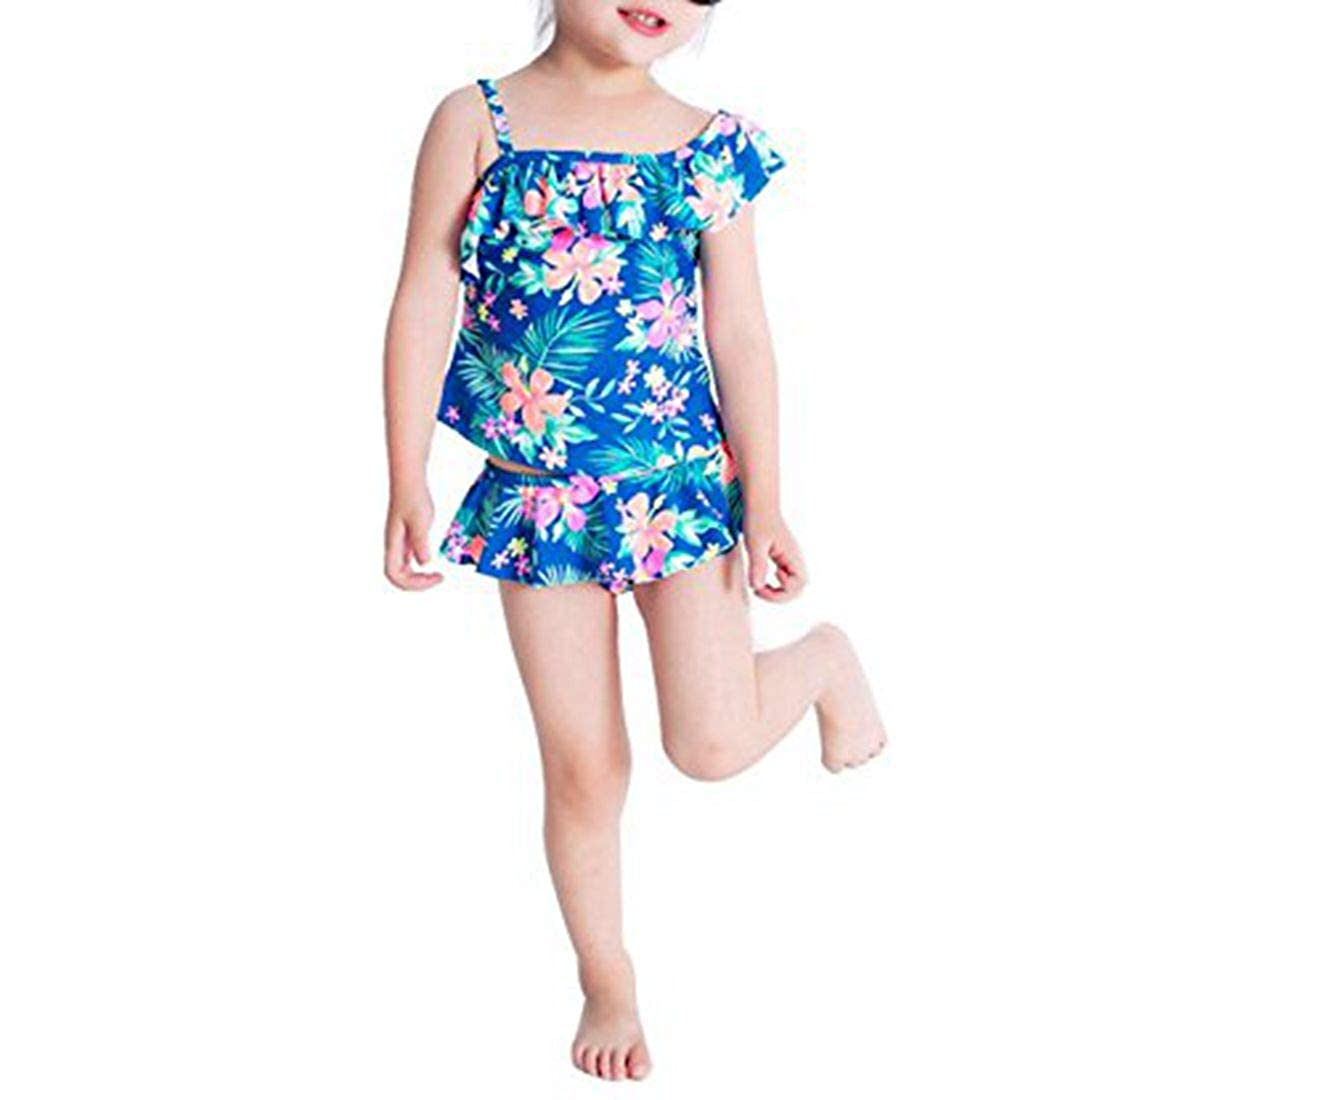 77e7b0b2845f6e Amazon.com  Alvivi Girls Toddlers Two Piece Tankini Swimsuit Hawaiian Ruffle  Swimwear Bathing Sets  Clothing